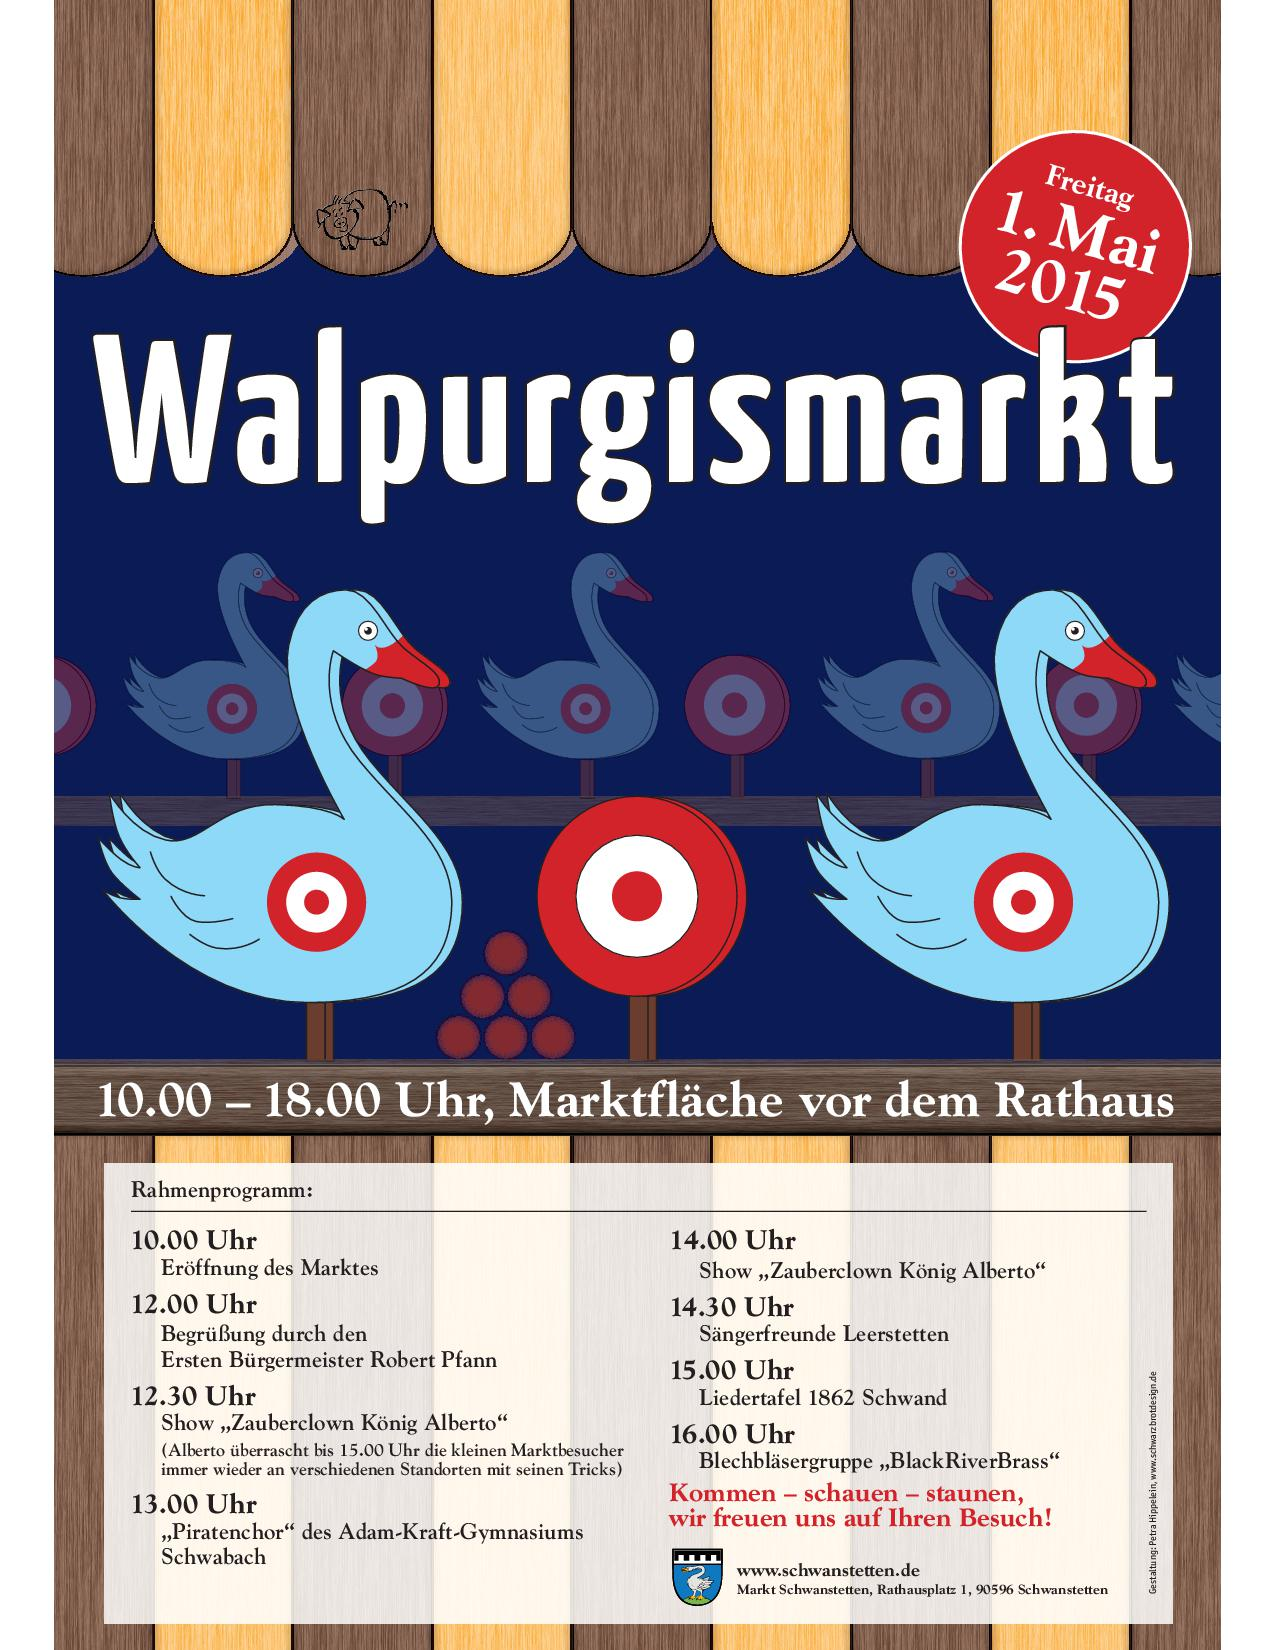 Walpurgisplakat_2015_A3-001